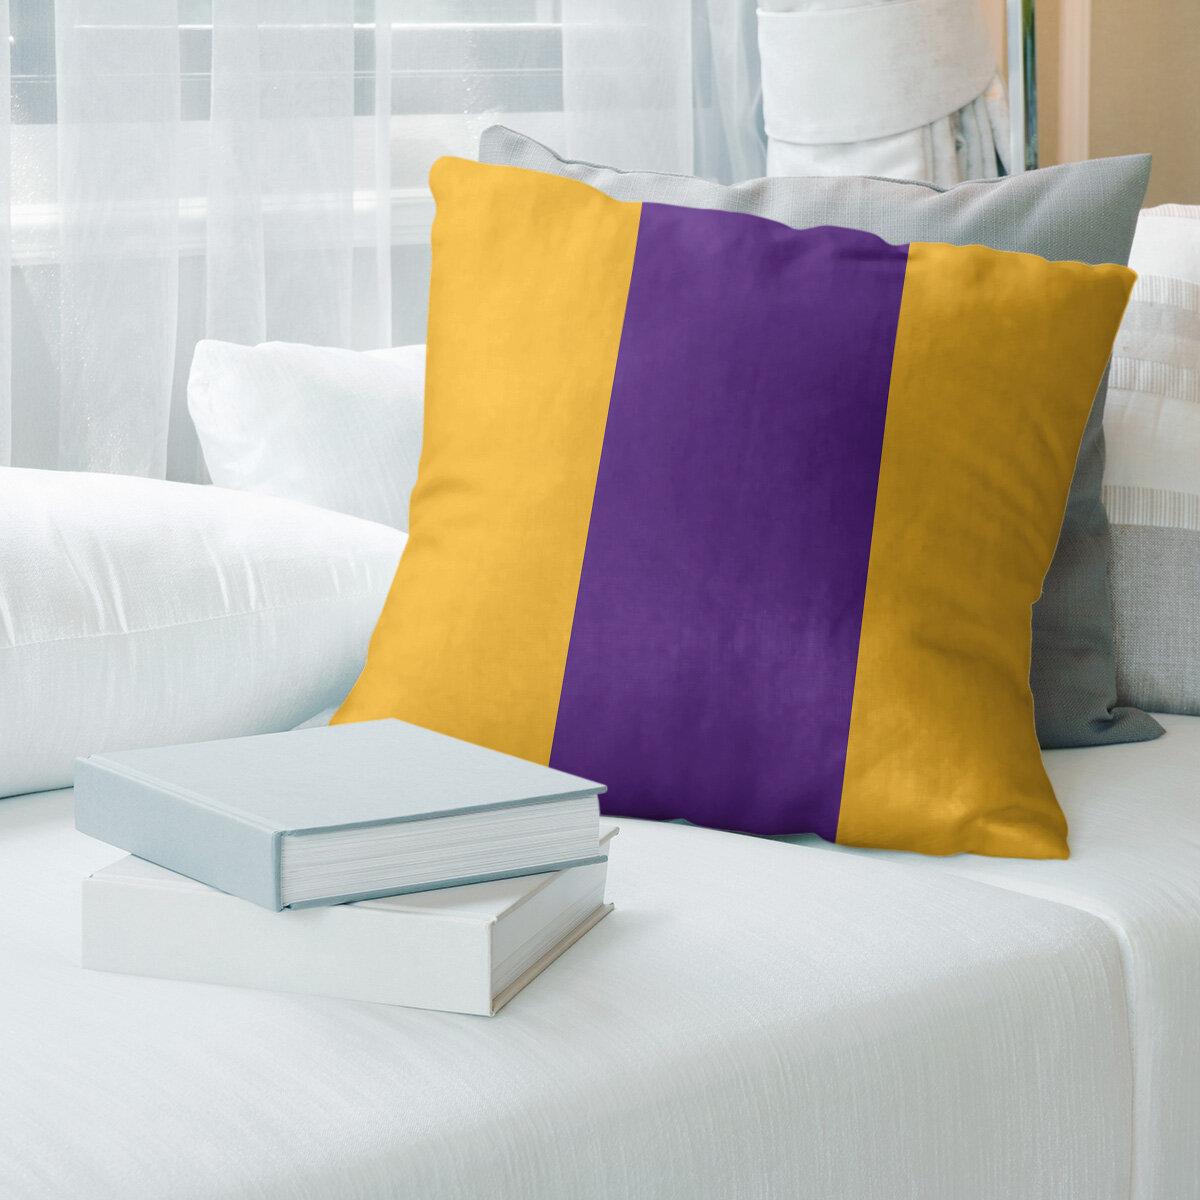 Yellow And Gold Artverse Throw Pillows You Ll Love In 2021 Wayfair